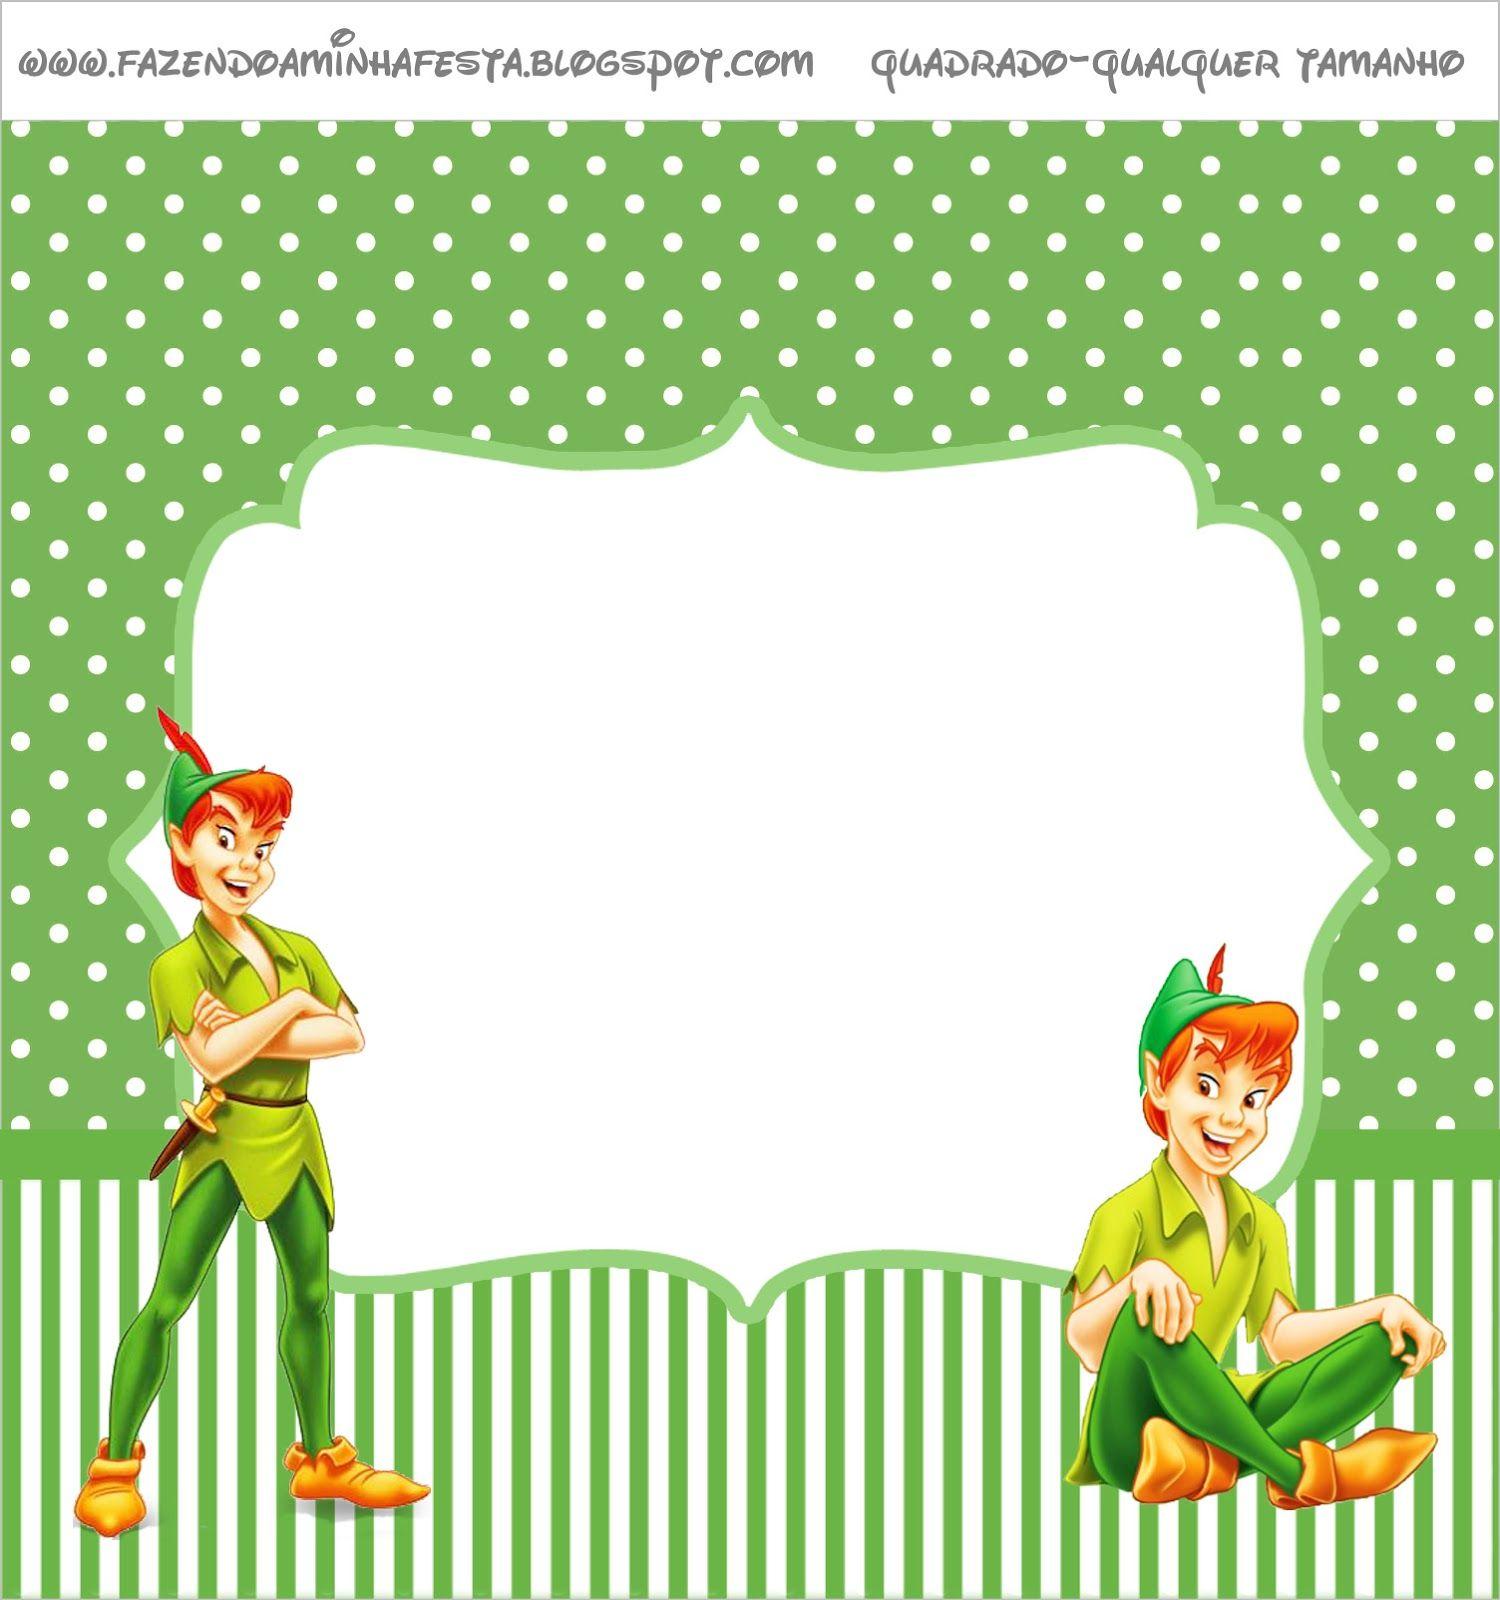 Peter Pan Etiquetas para Imprimir Gratis Xoel